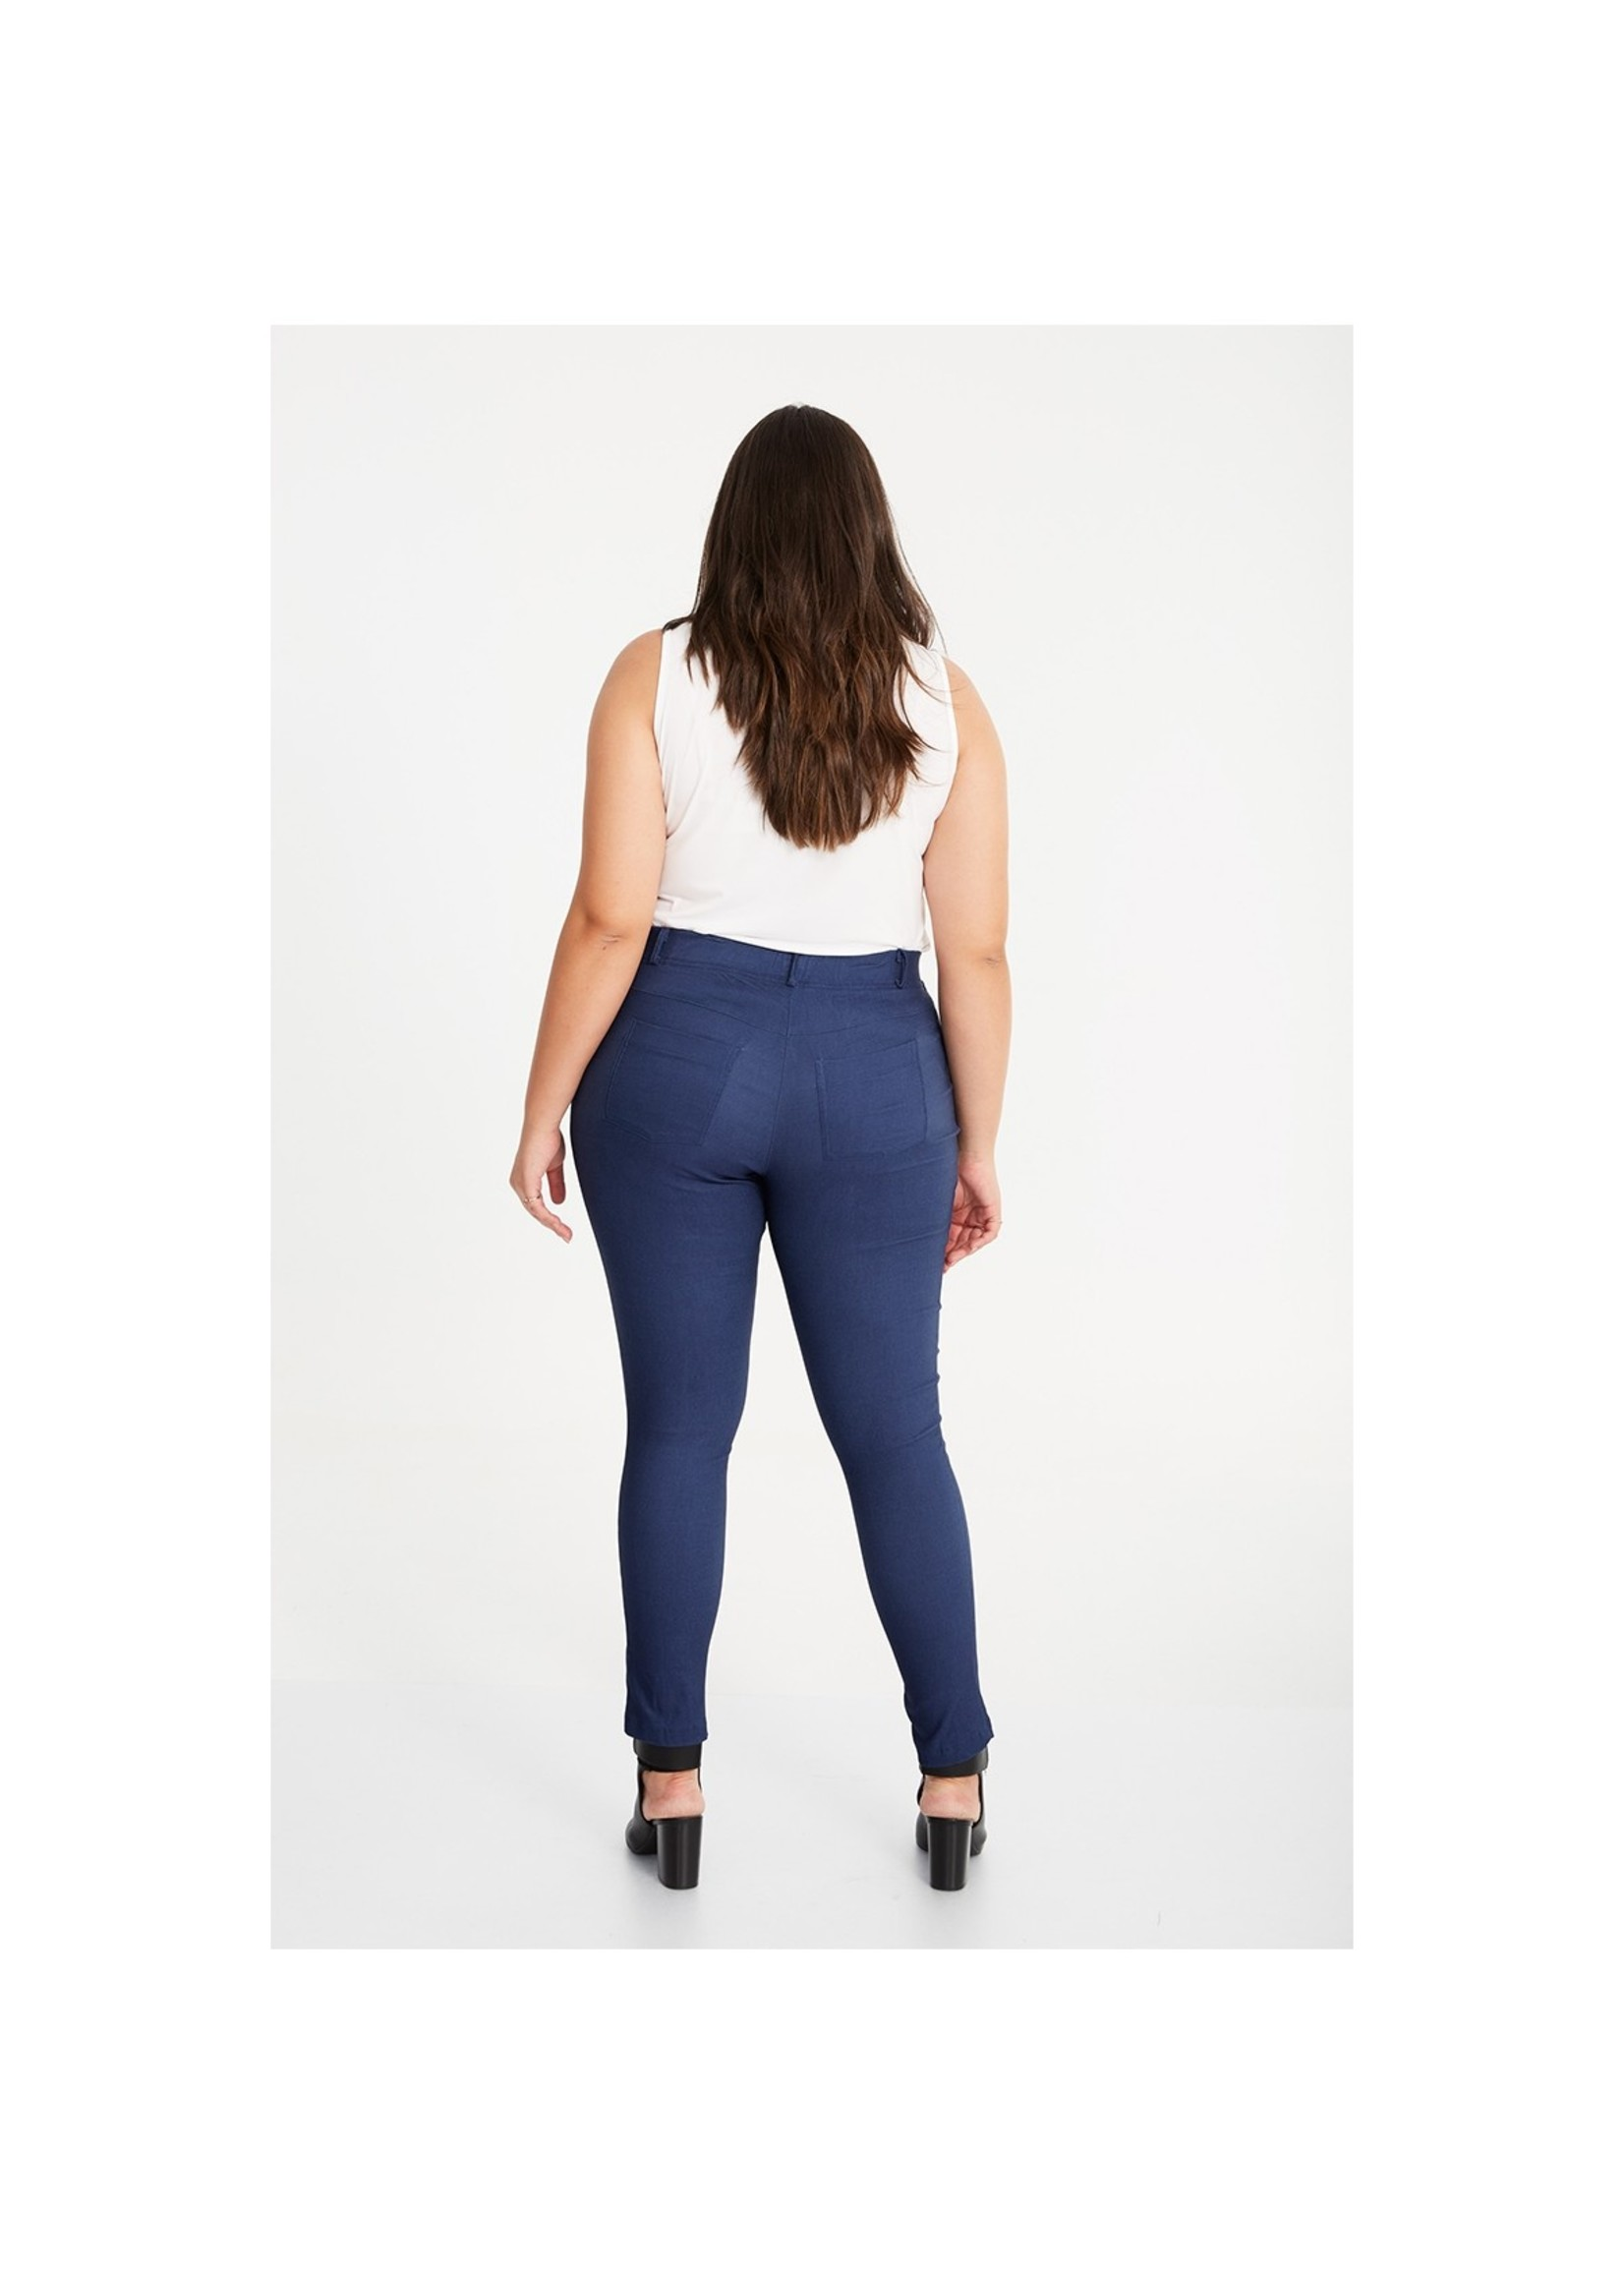 SPG Woman Stretch Pants